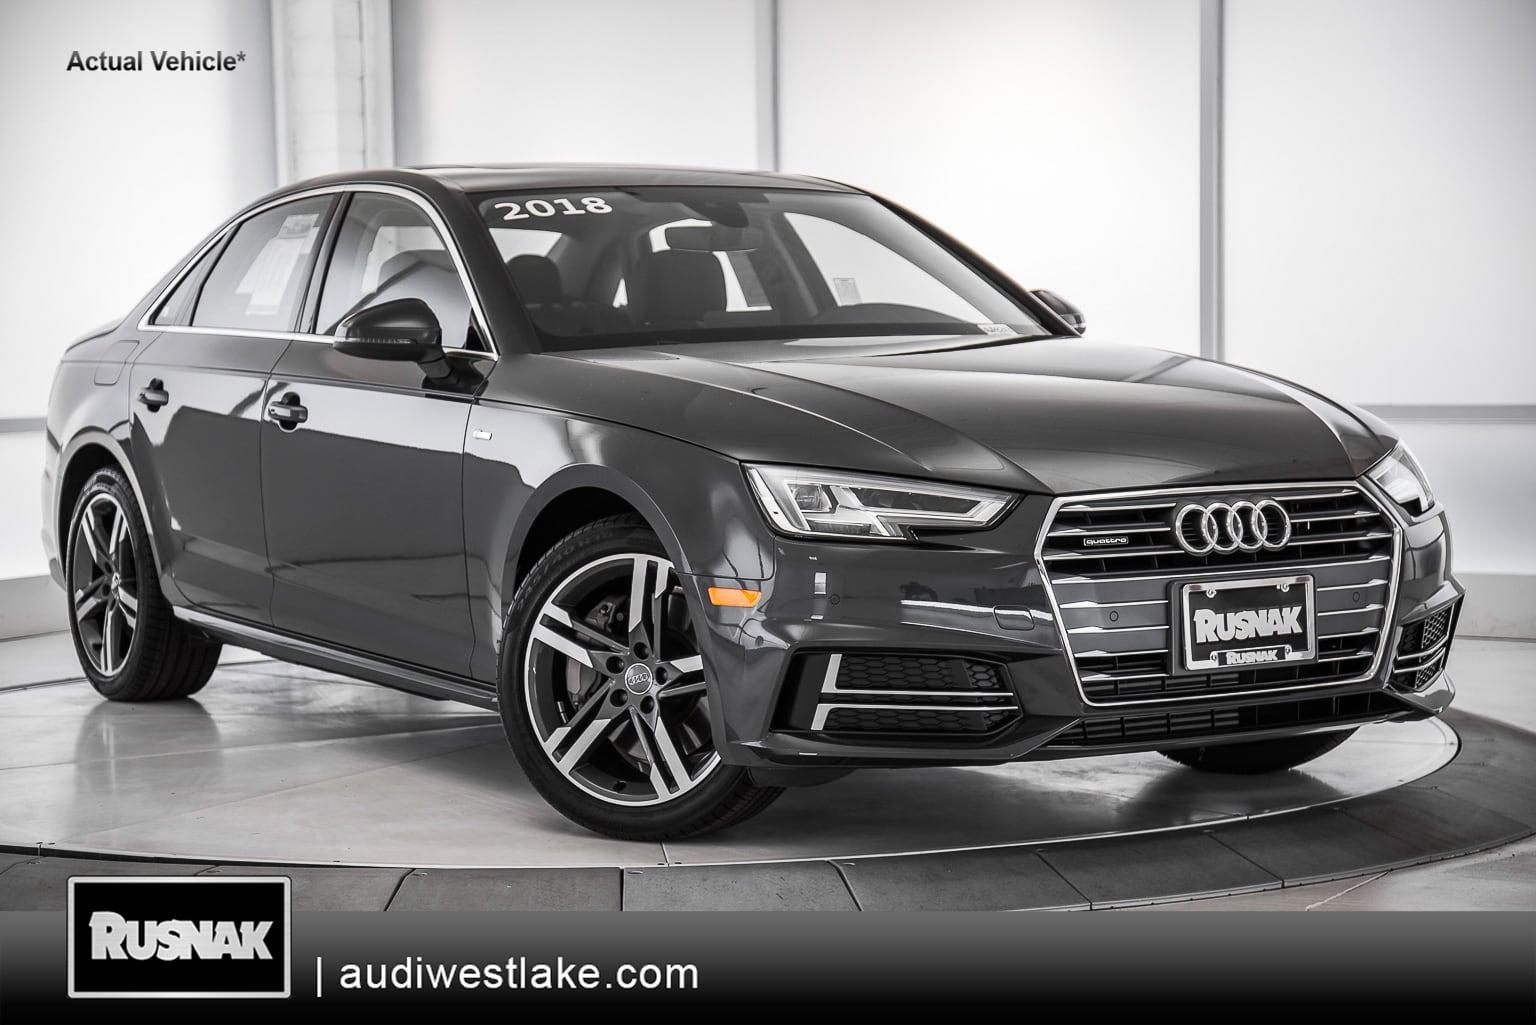 Certified Preowned Audi Dealership Westlake Village CA Preowned - Rusnak westlake audi